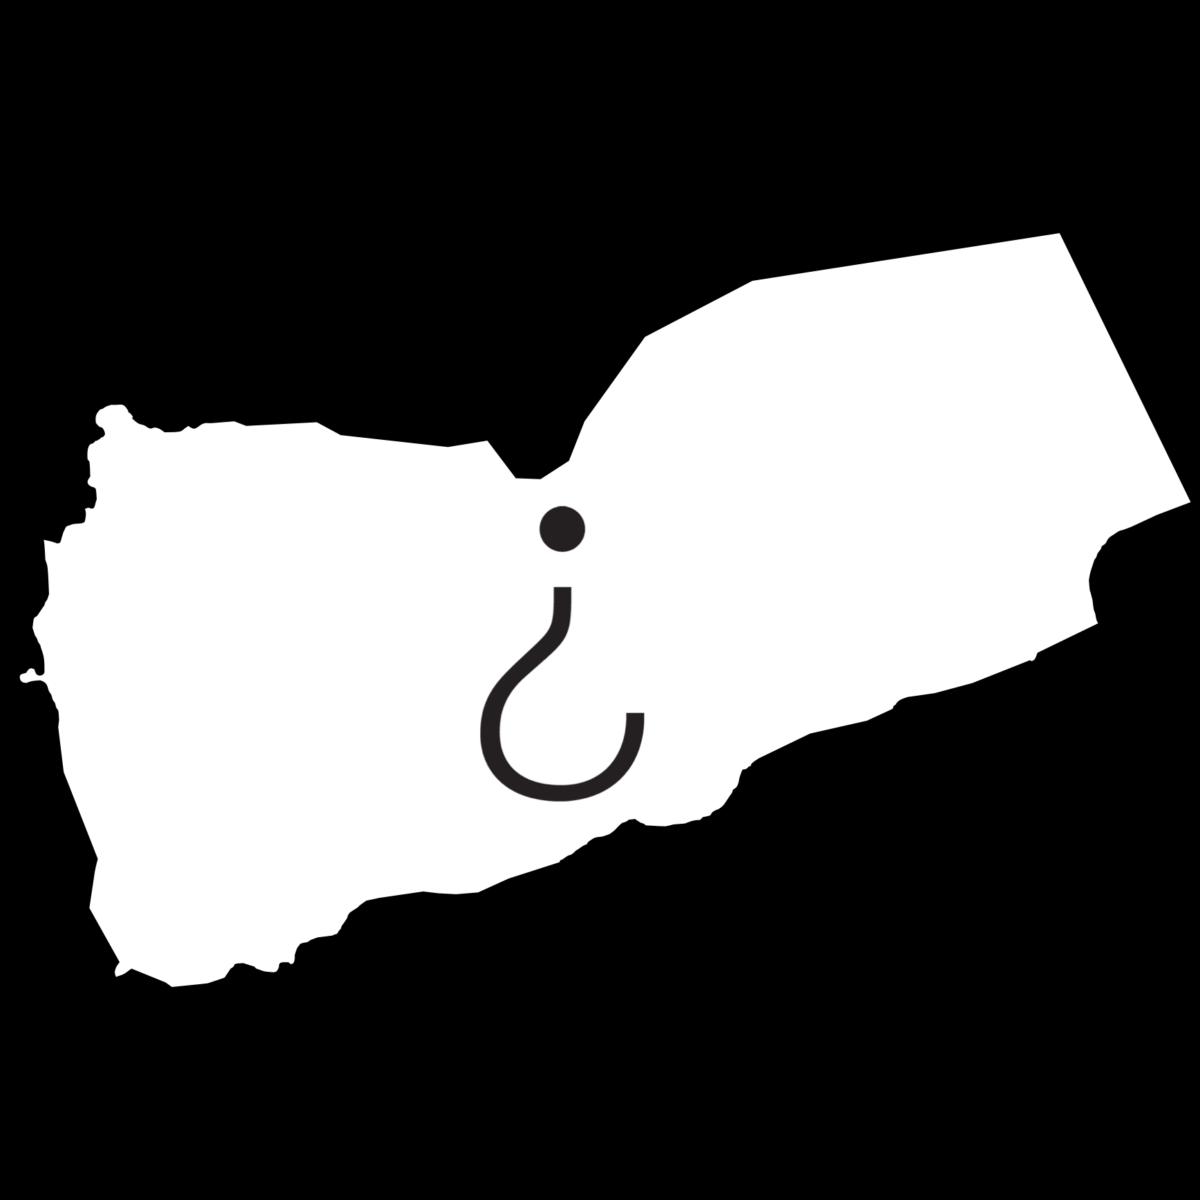 Yemen Project Release: Attacks Causing Grave Civilian Harm